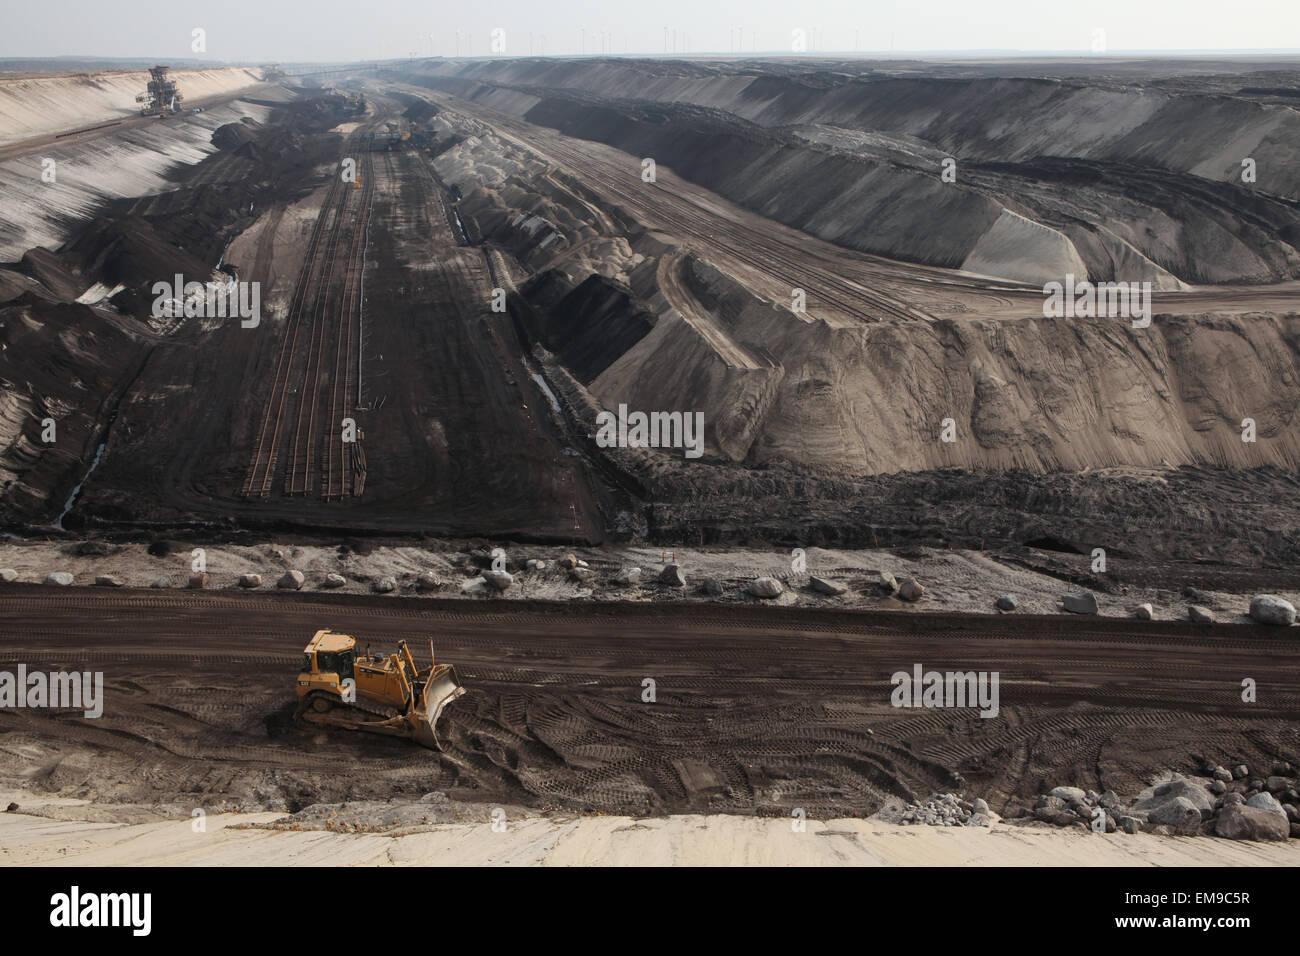 Open-pit coal mining Cottbus Nord near Cottbus, Lower Lusatia, Brandenburg, Germany. Huge open-pit coal mining by - Stock Image